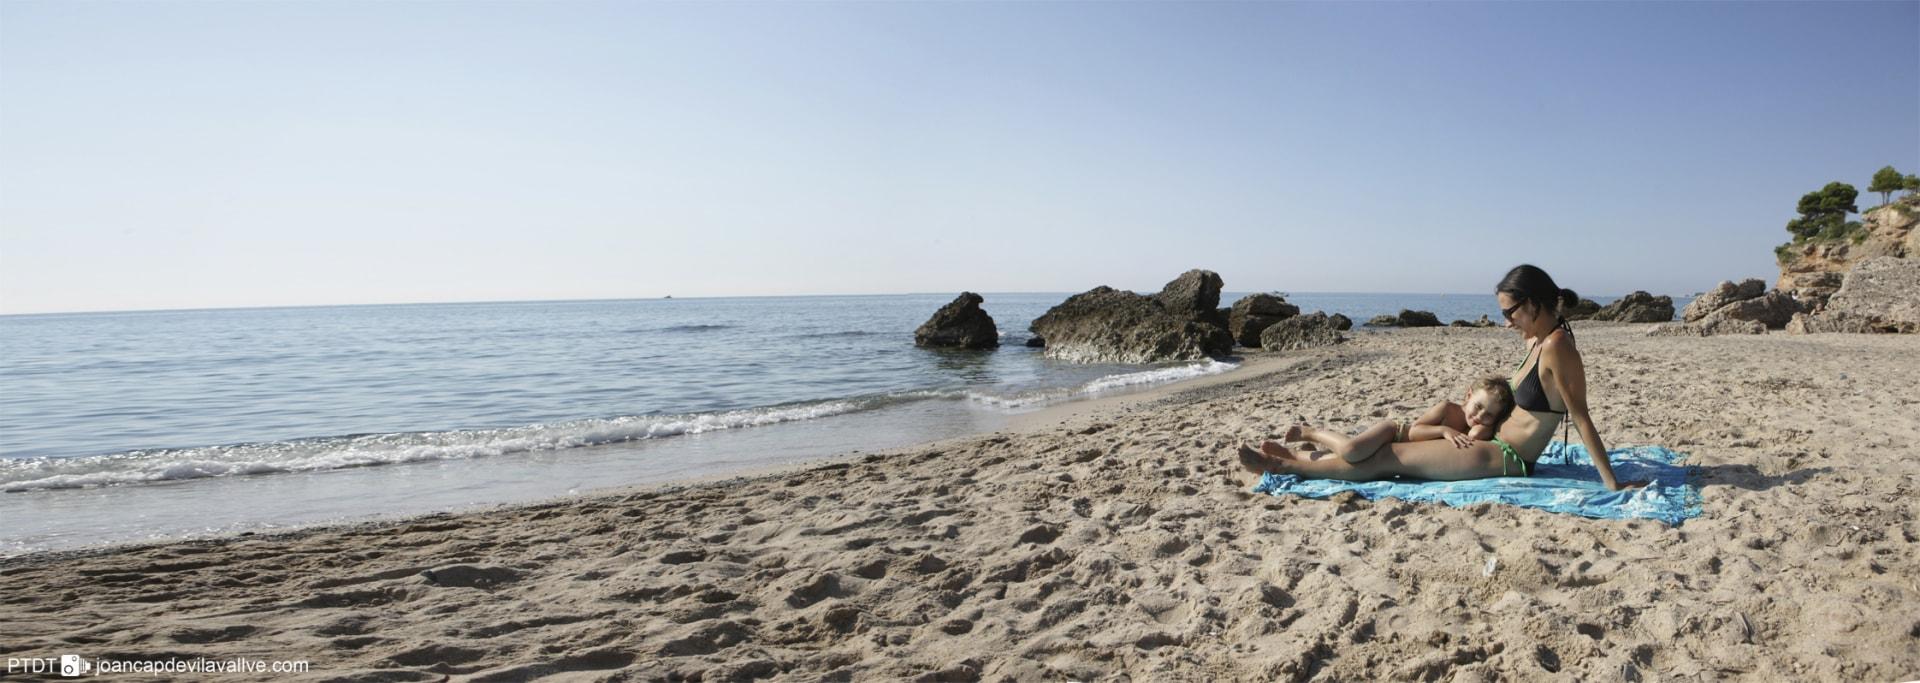 costa-dorada-playa